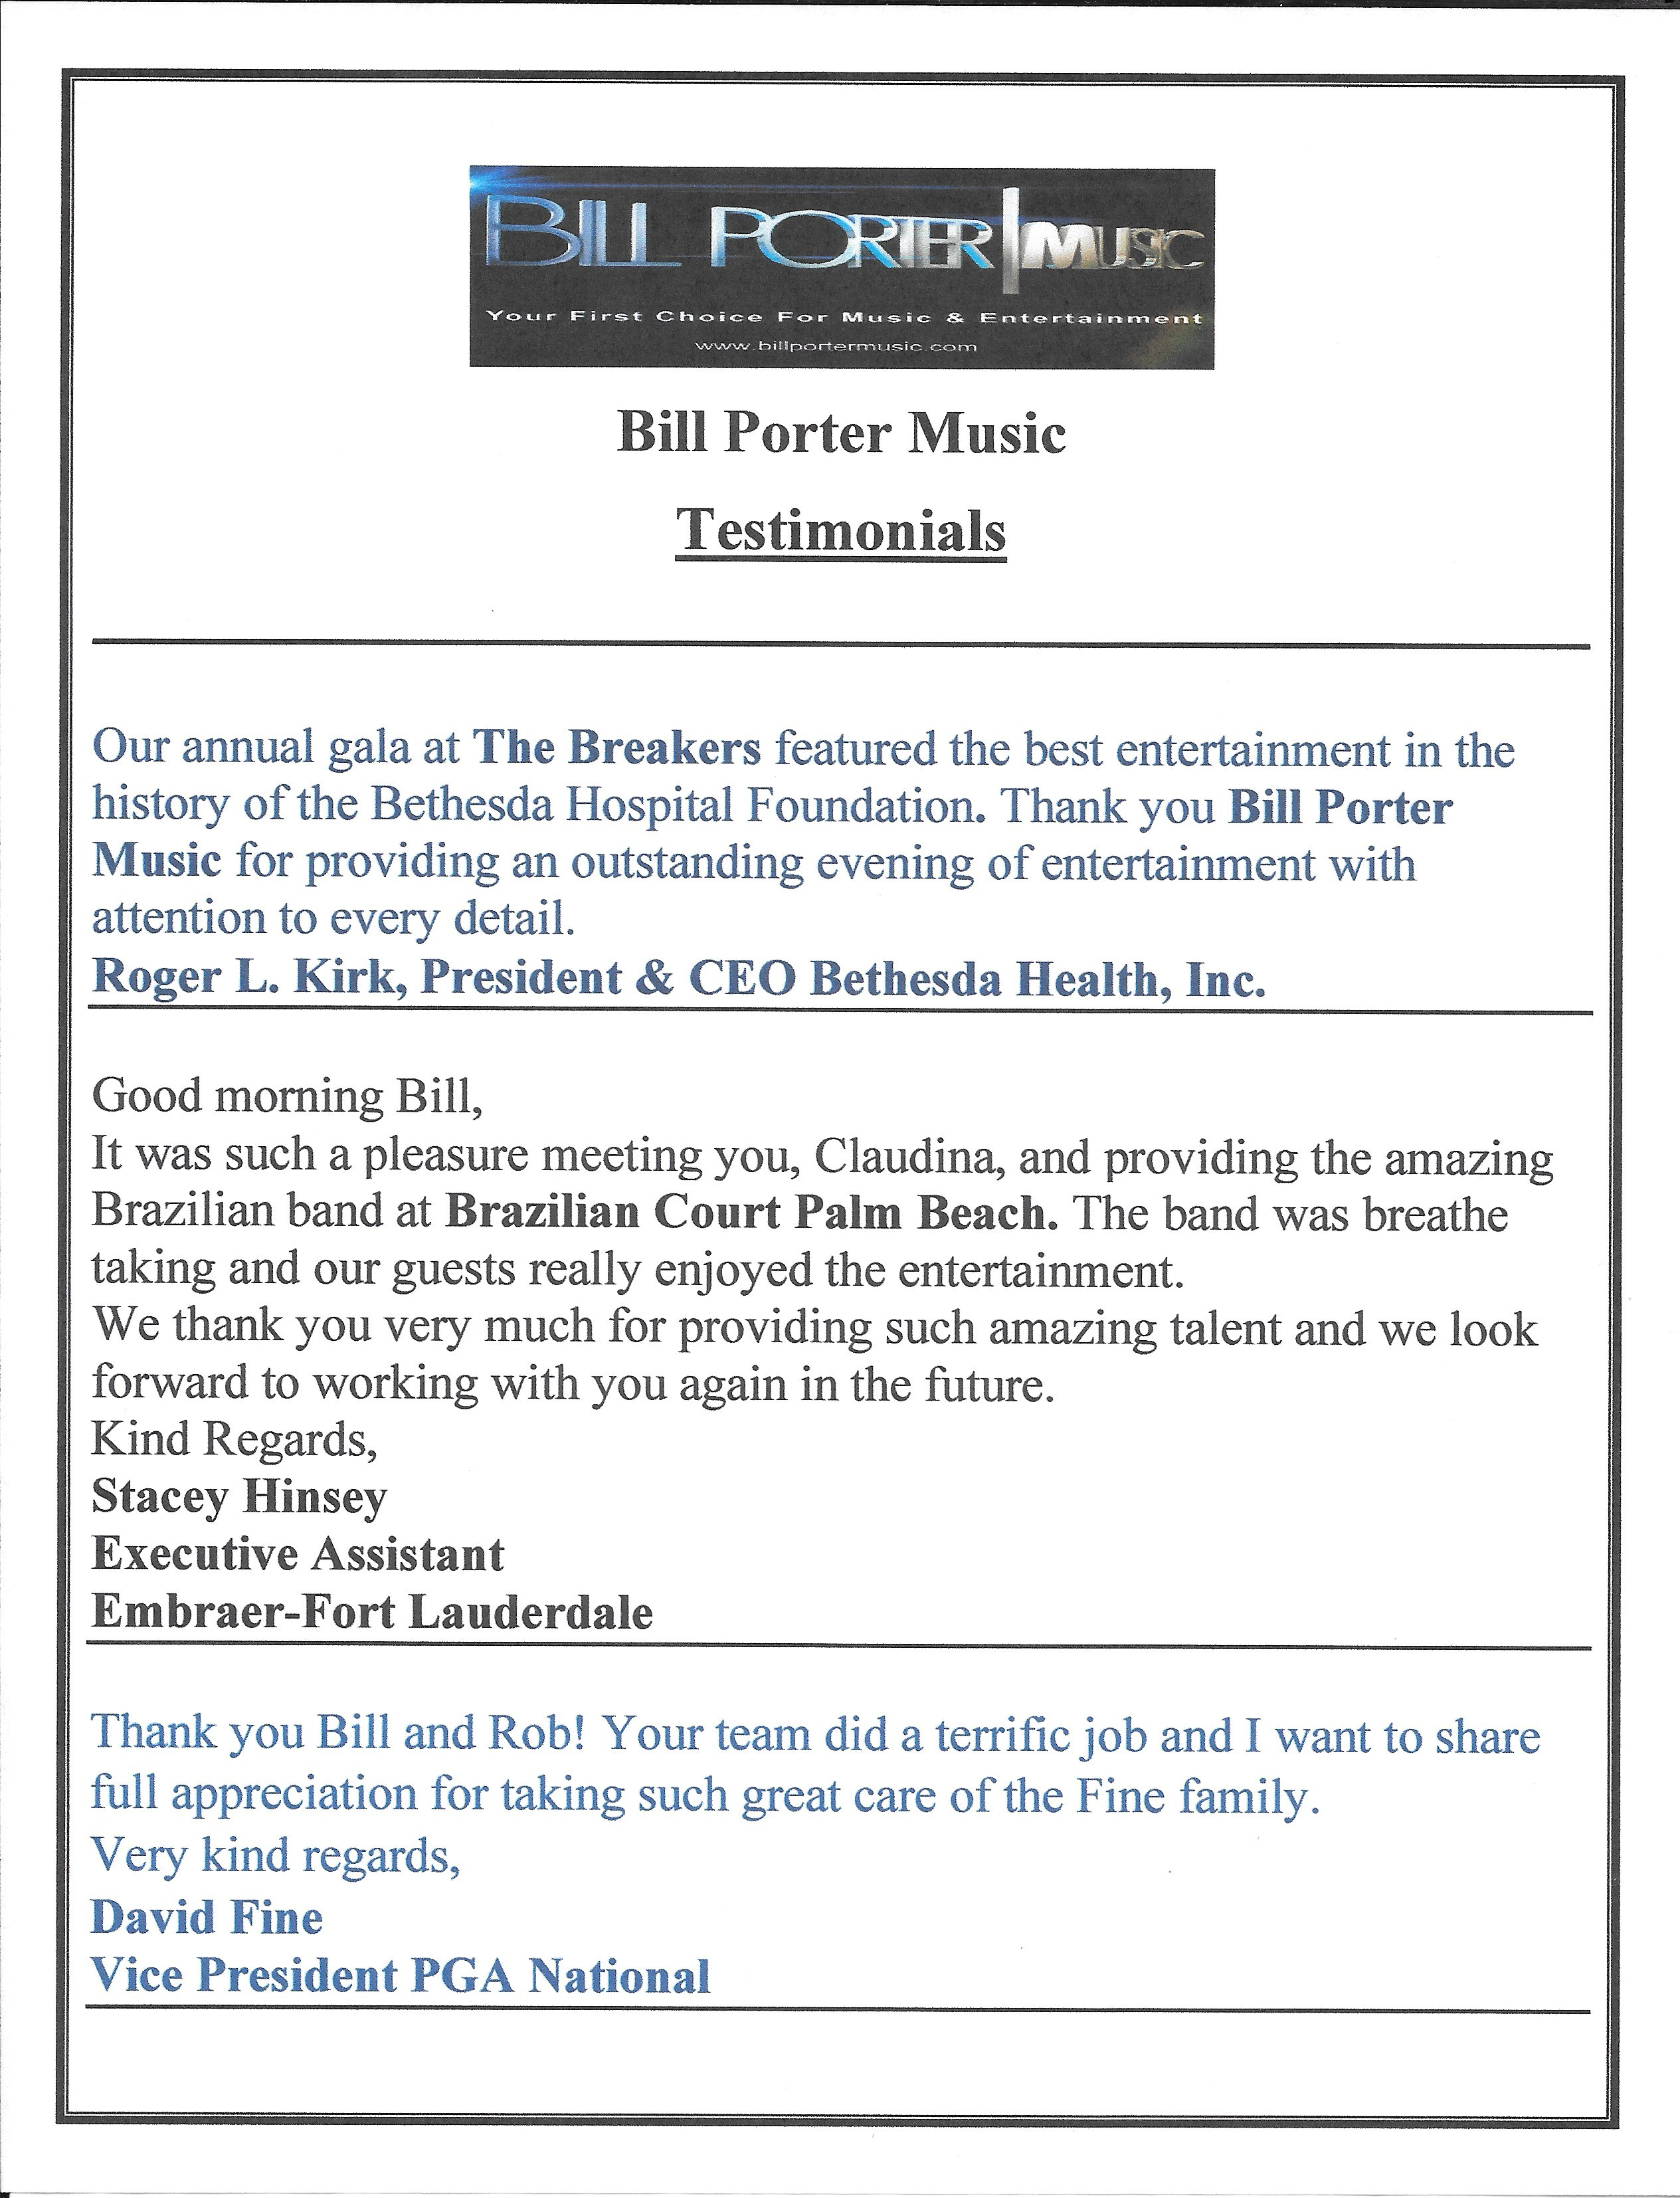 BPM typed testimonials page 1